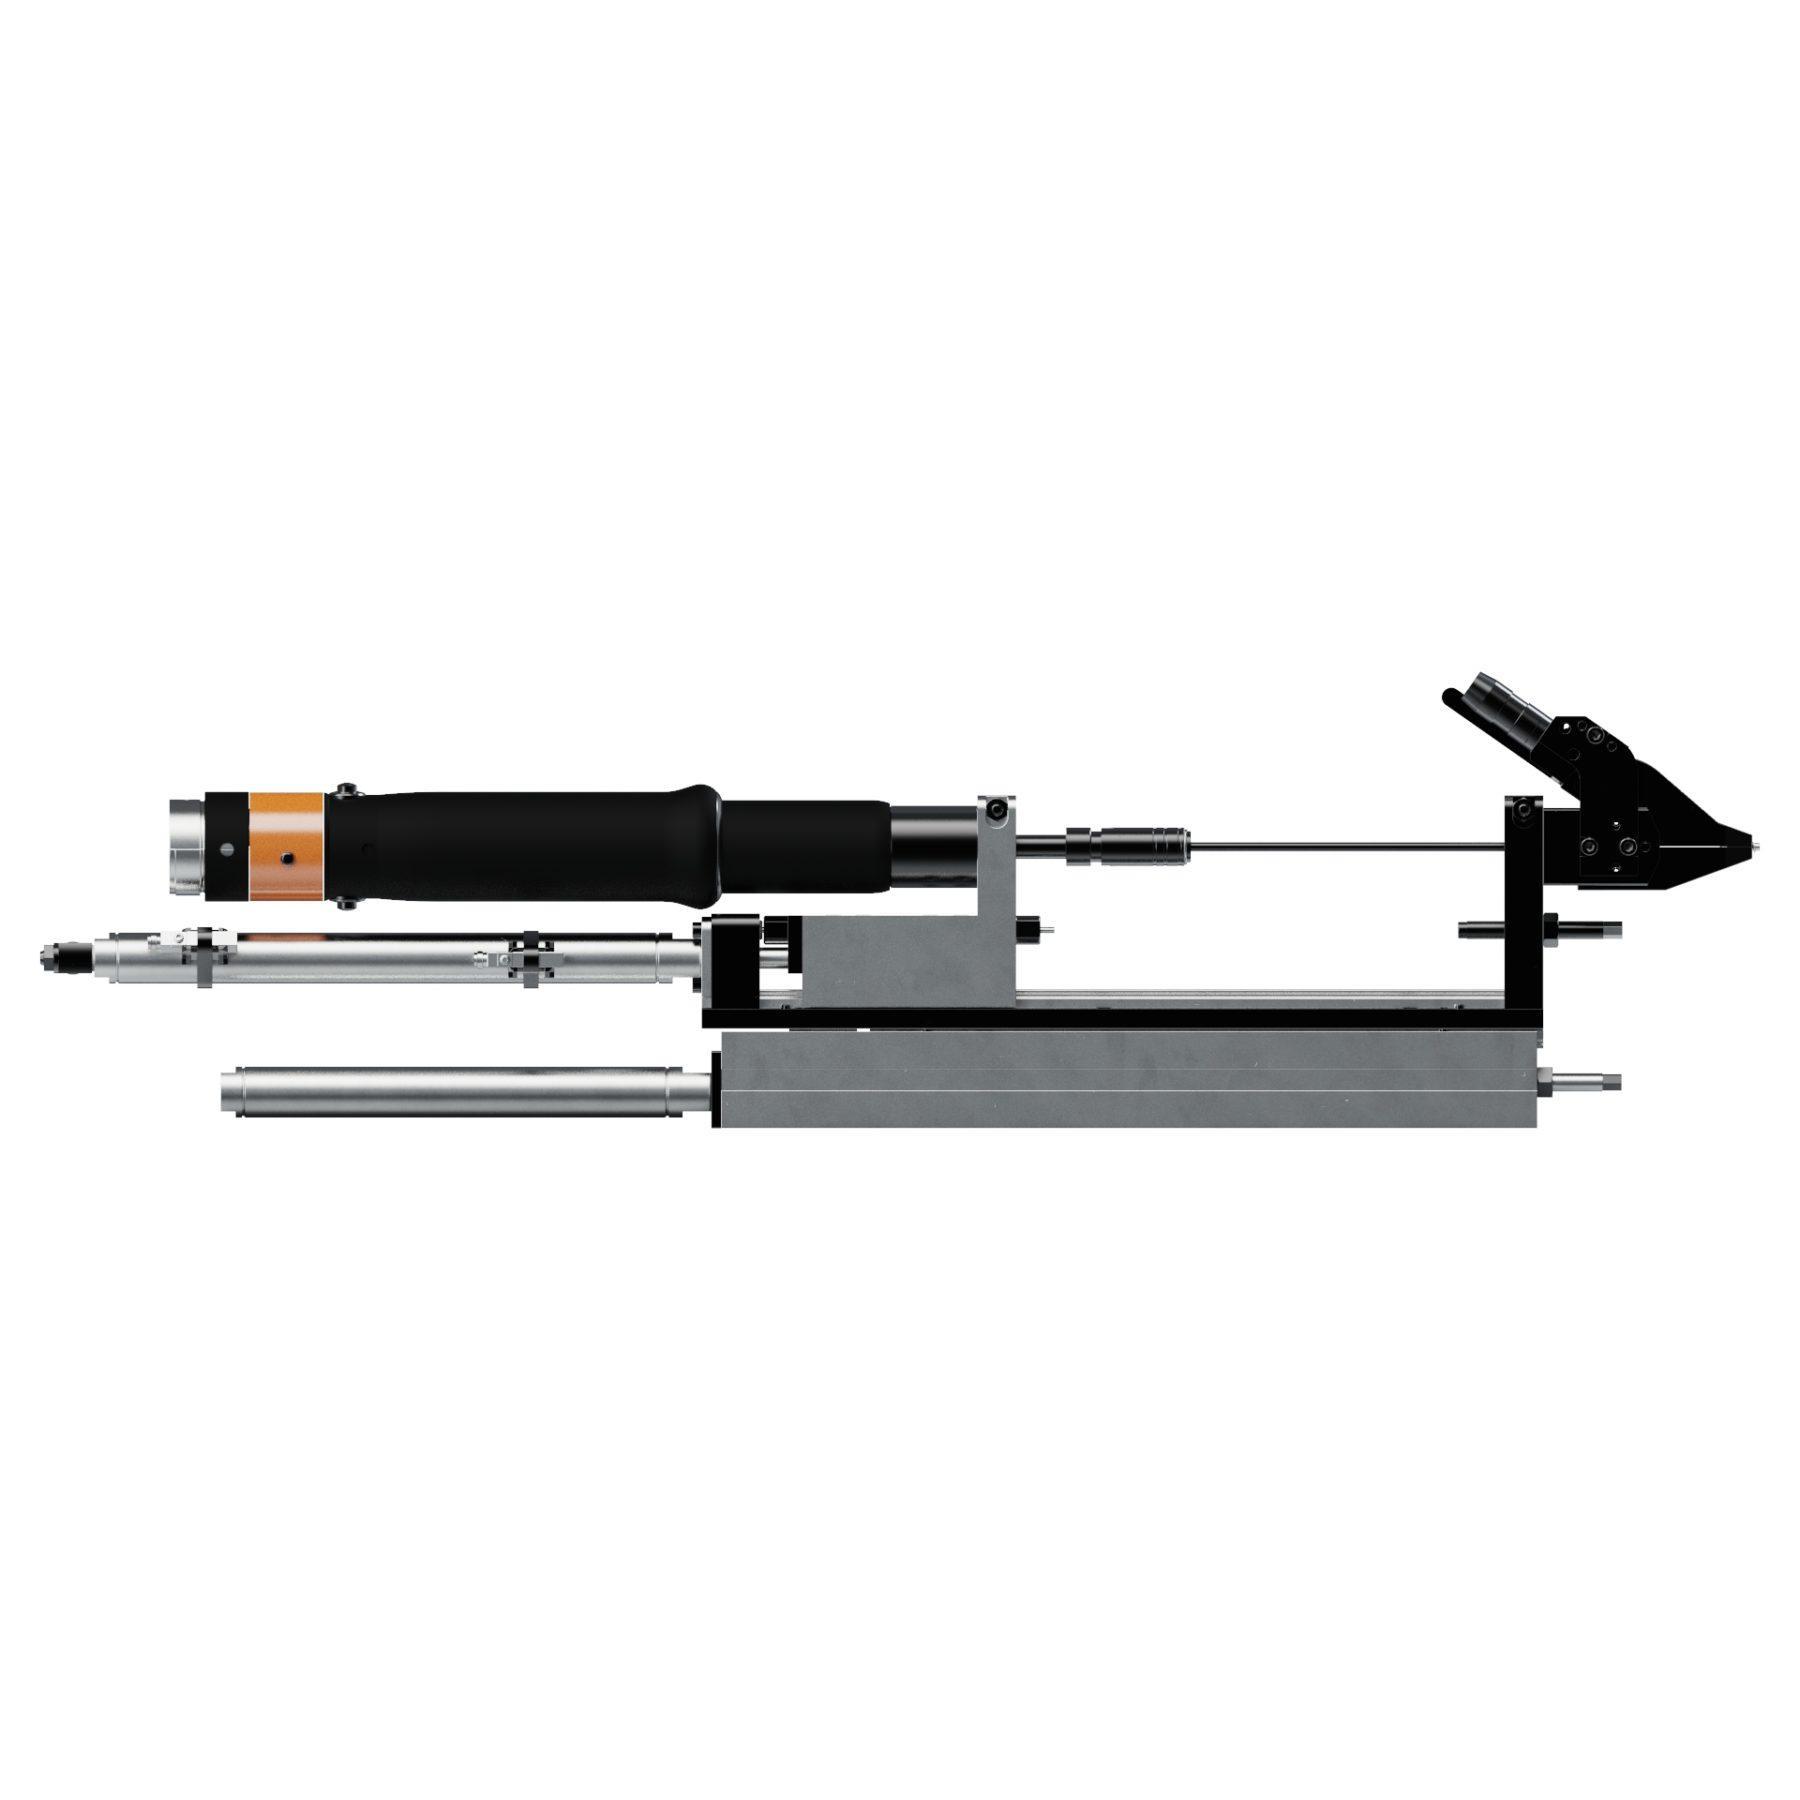 MiniMod Mini Automatic Screwdriver Head Type 1 Side 4